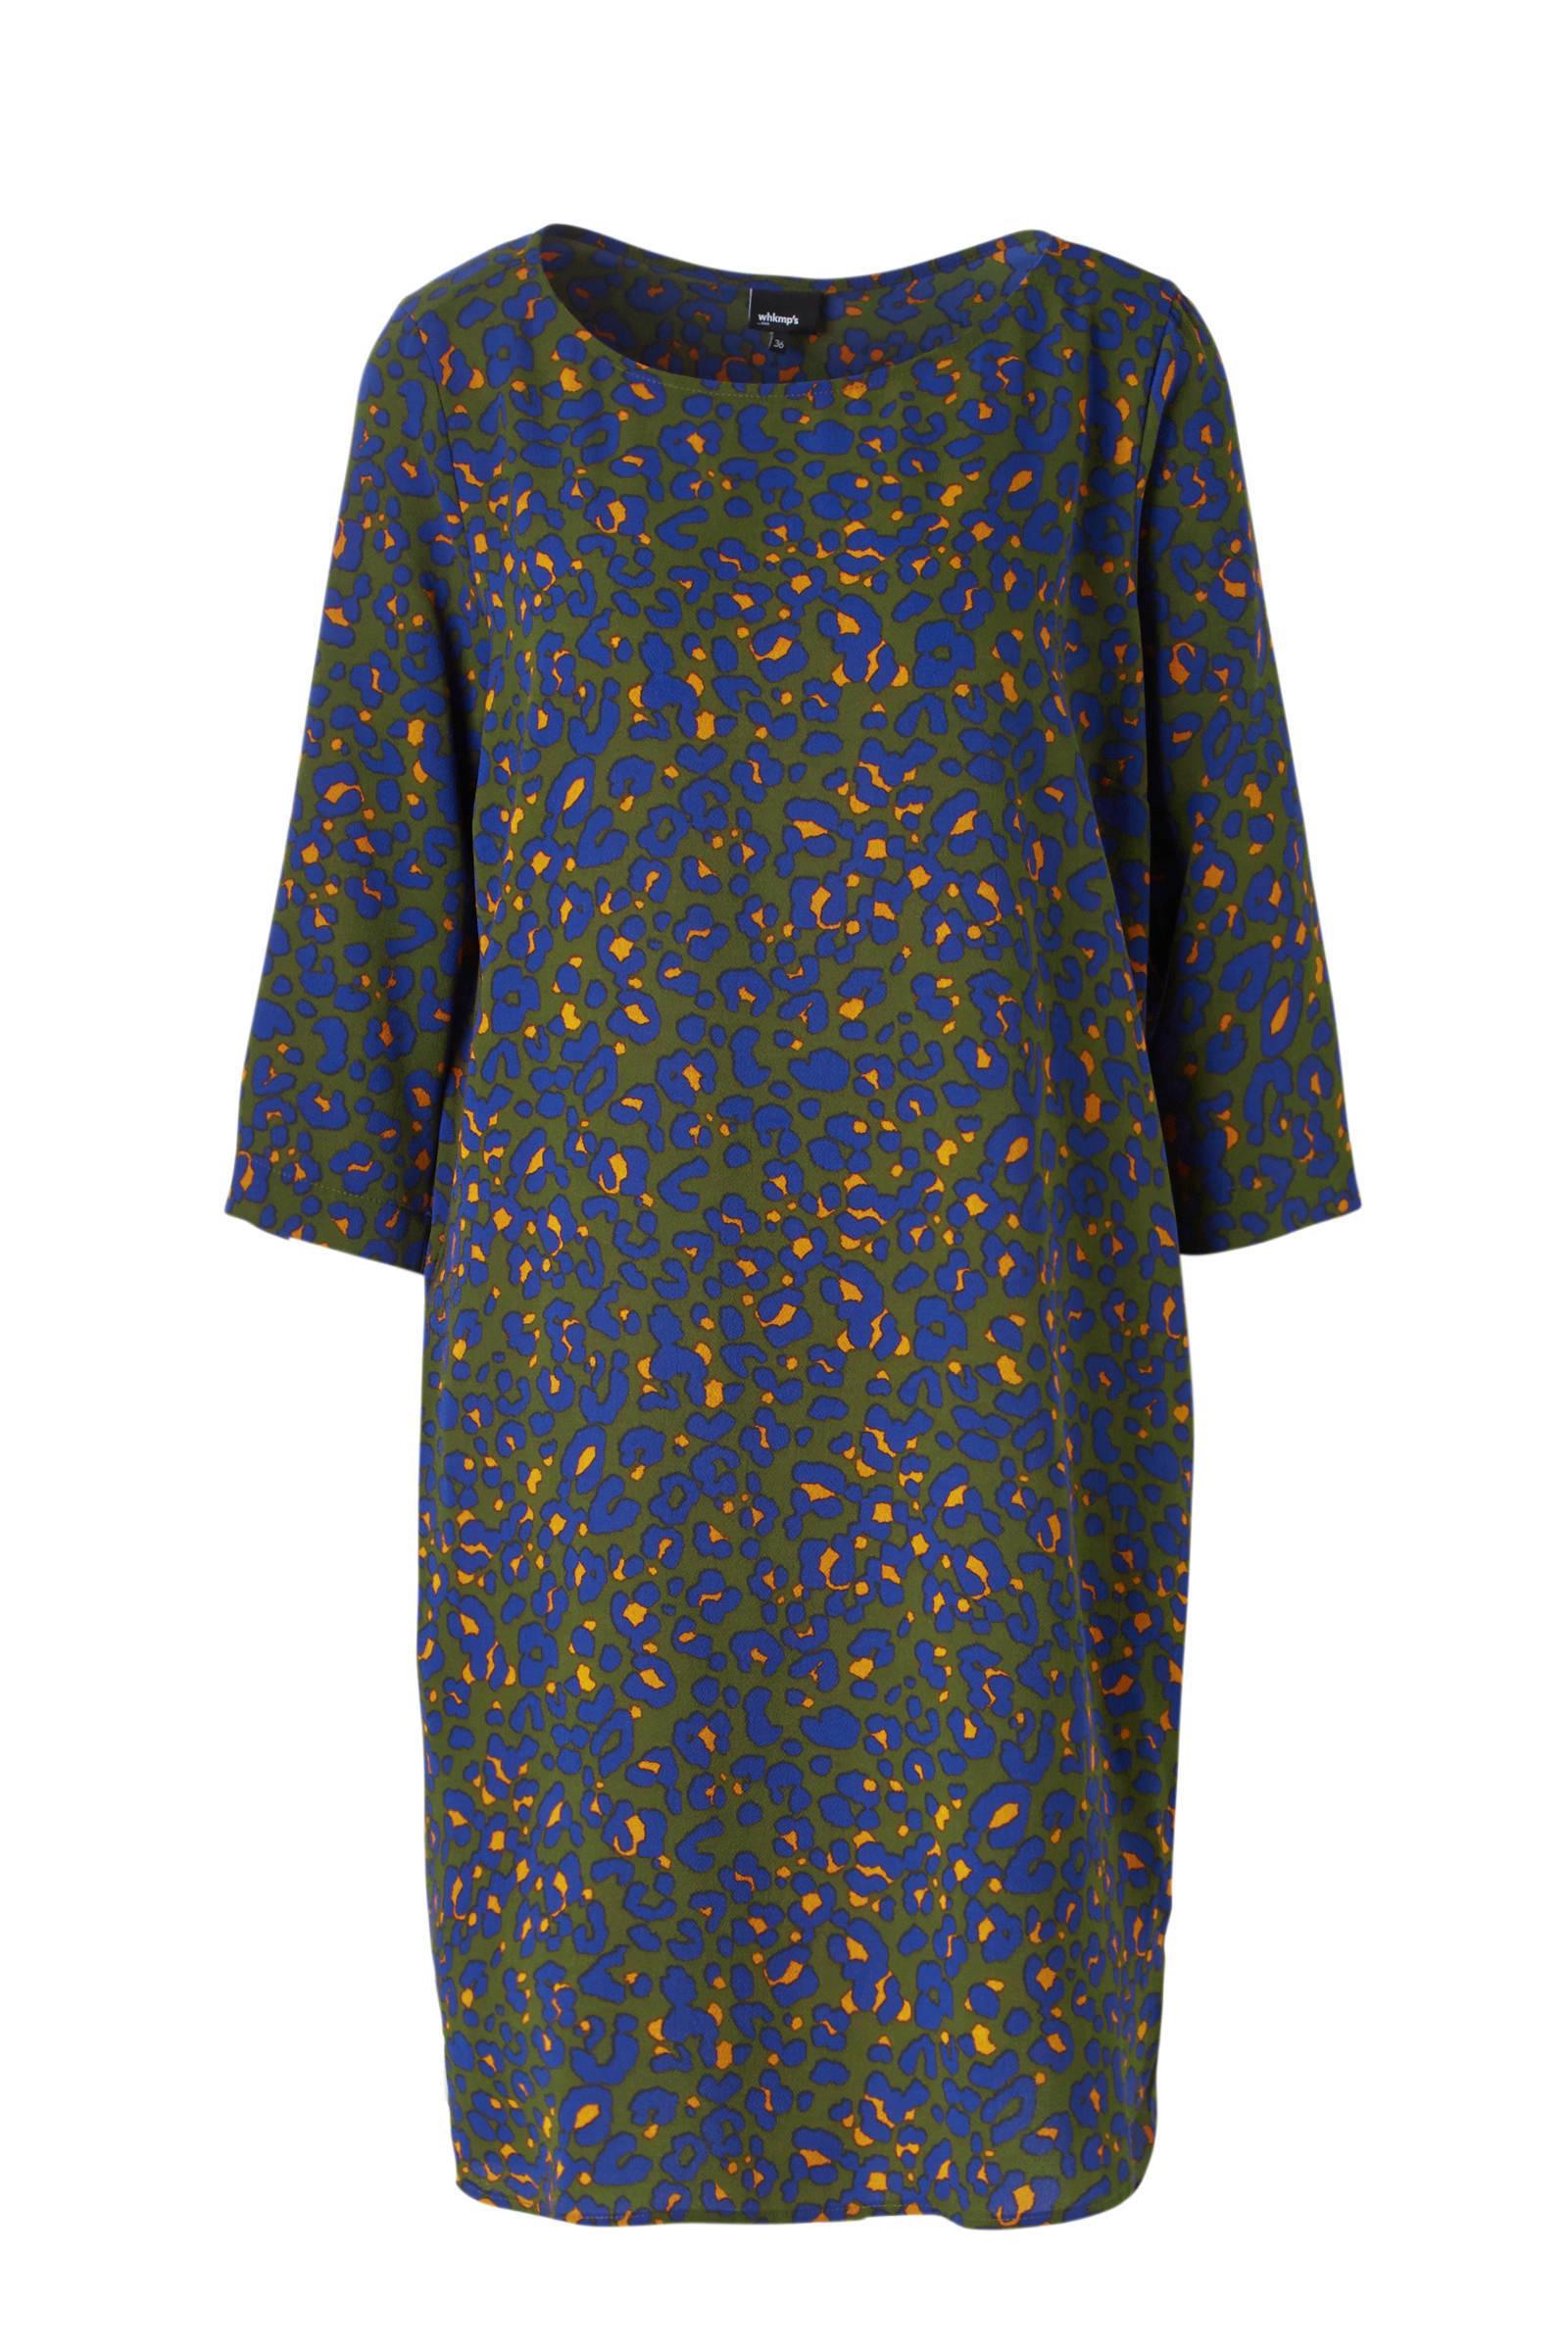 whkmp's own jurk met panterprint